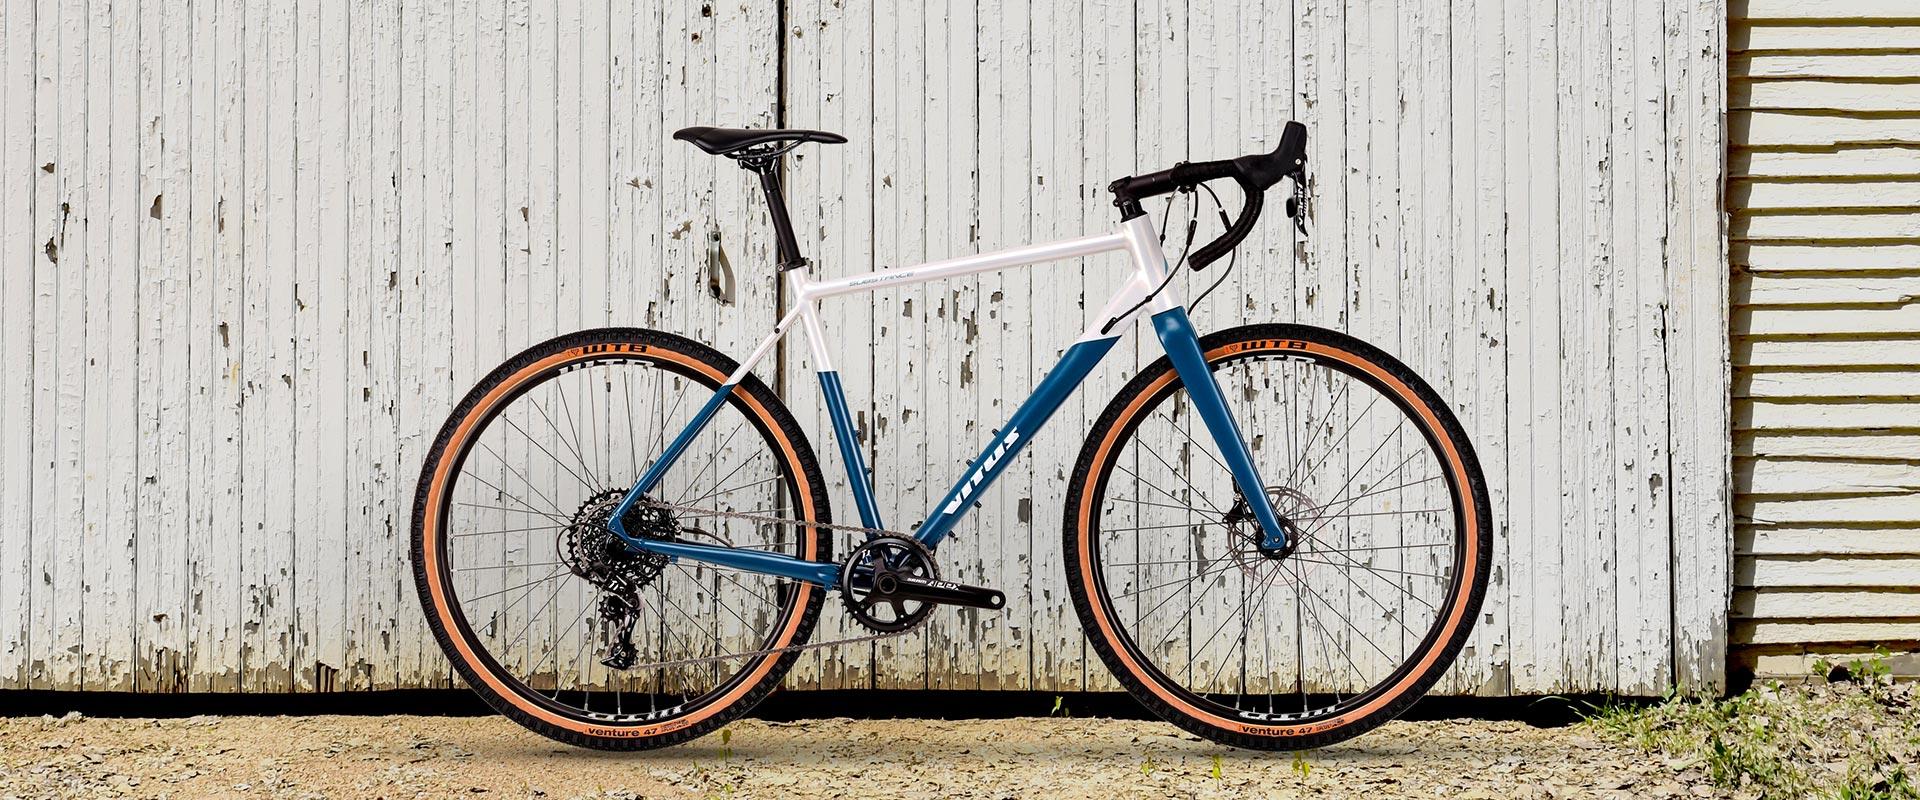 Substance VRS 1 Adventure Road Bike